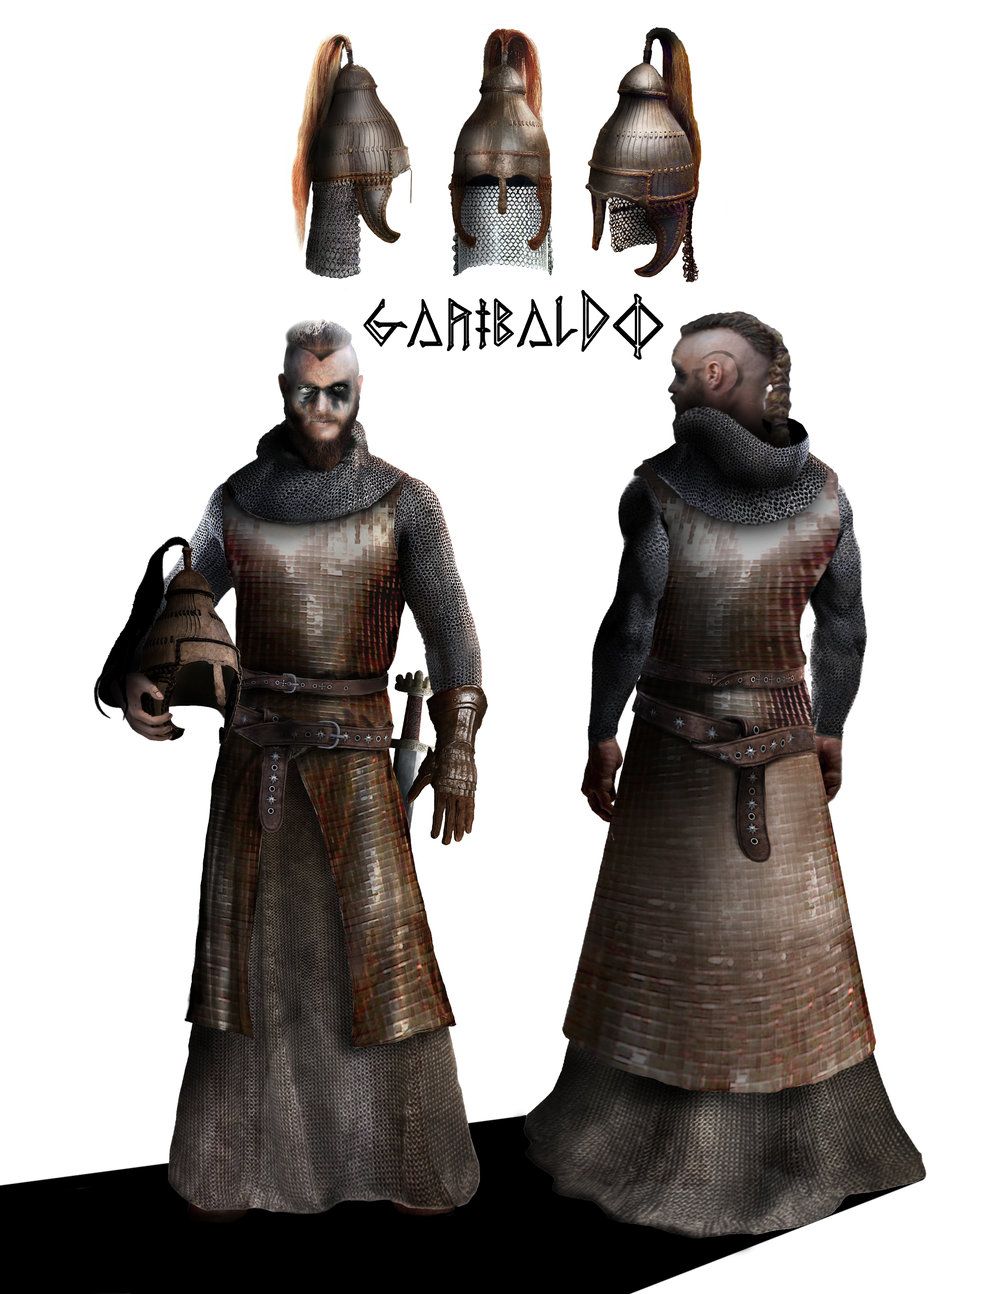 GARIBALDO - Costume Design